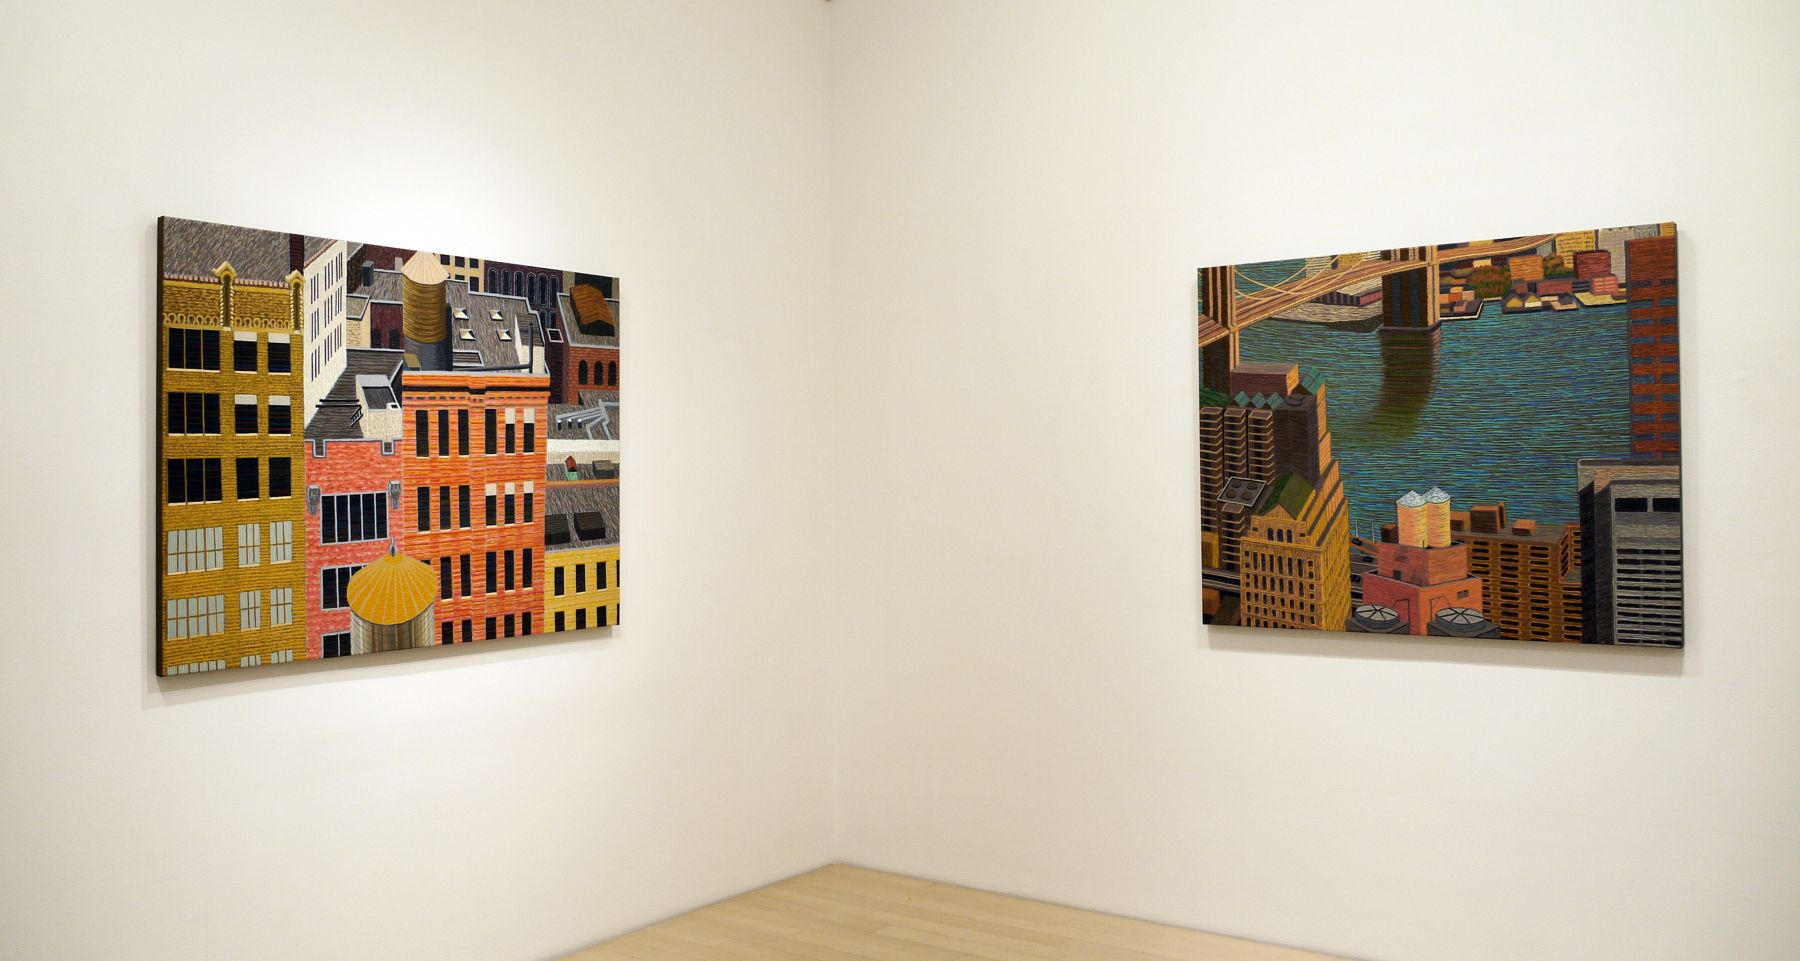 Yvonne Jacquette: Paintings 1981-2016